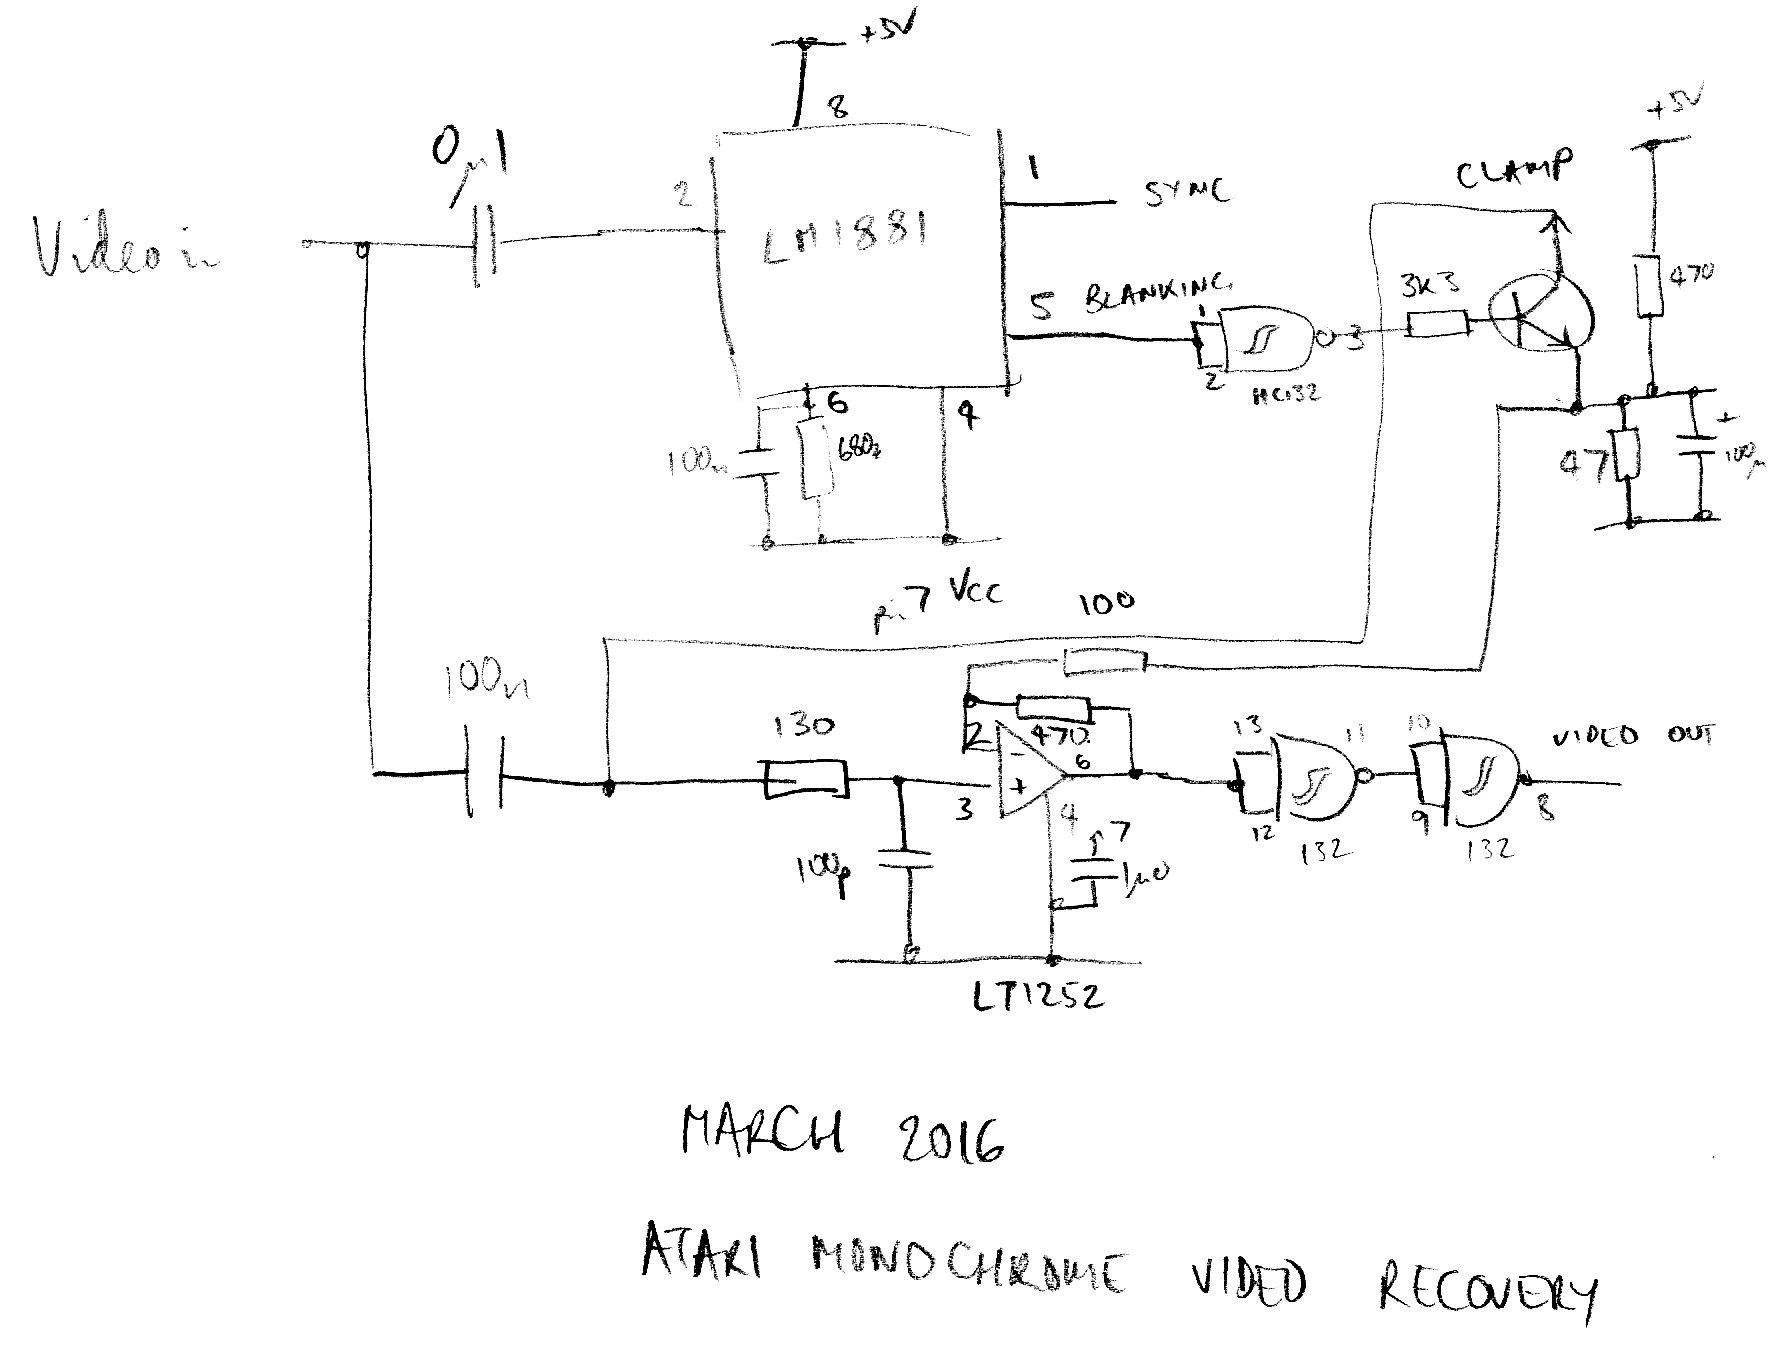 Atari Pole Position Wiring Diagram Schematic Electronic Arcade Martinjonestechnologyrhmartinjones At